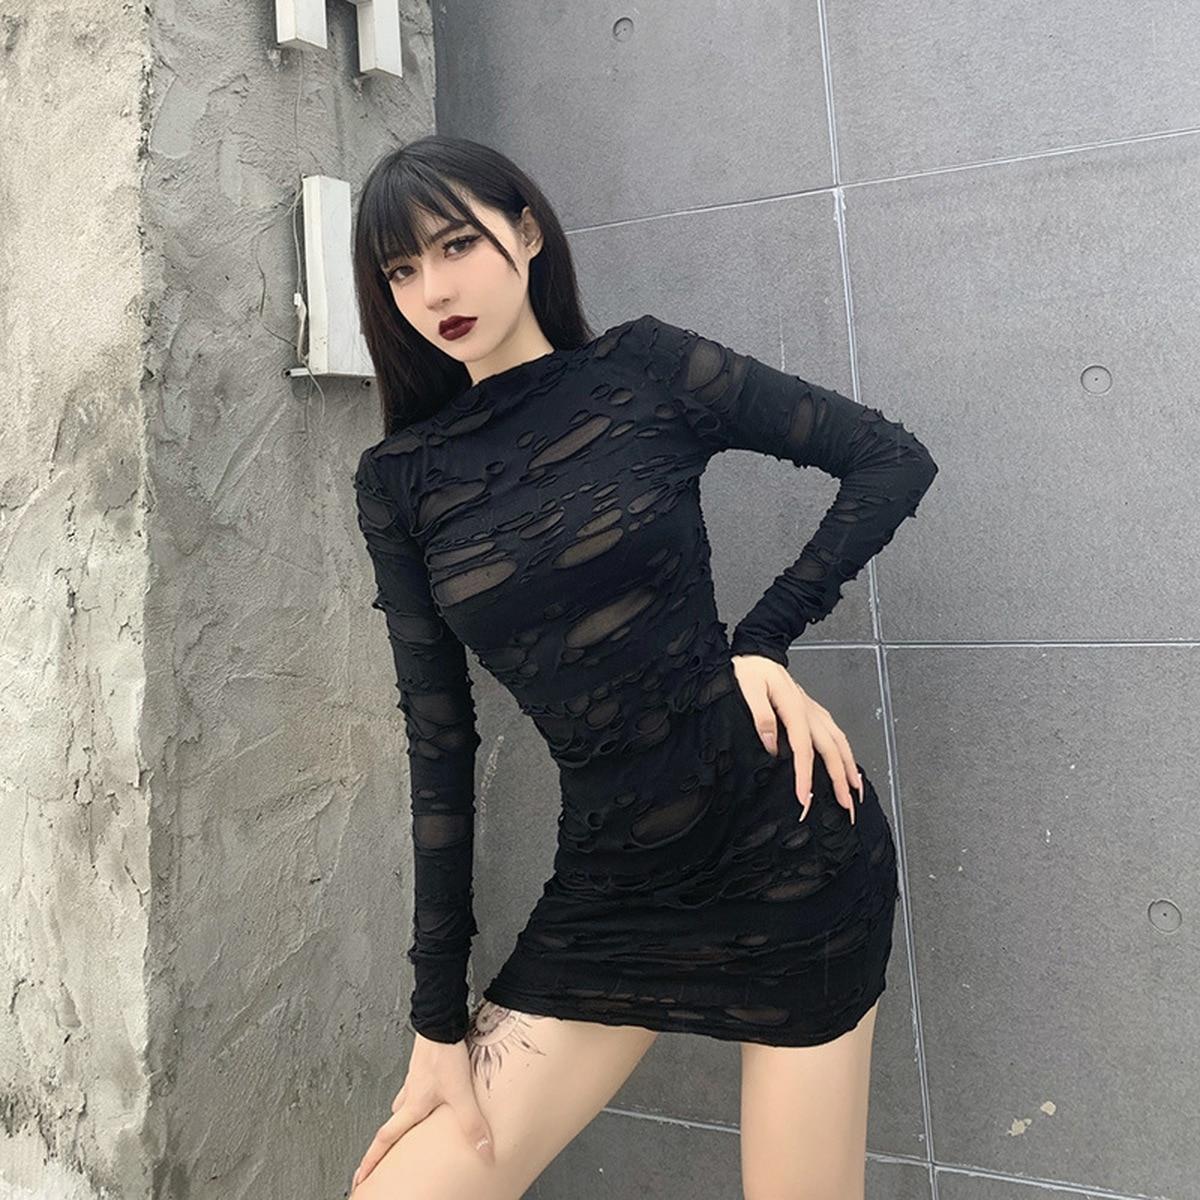 Helisopus New Gothic Black Mini Dress Streetwear Rock Punk Hollow Retro High Waist Long Sleeve Bodycon Party Dresses 7